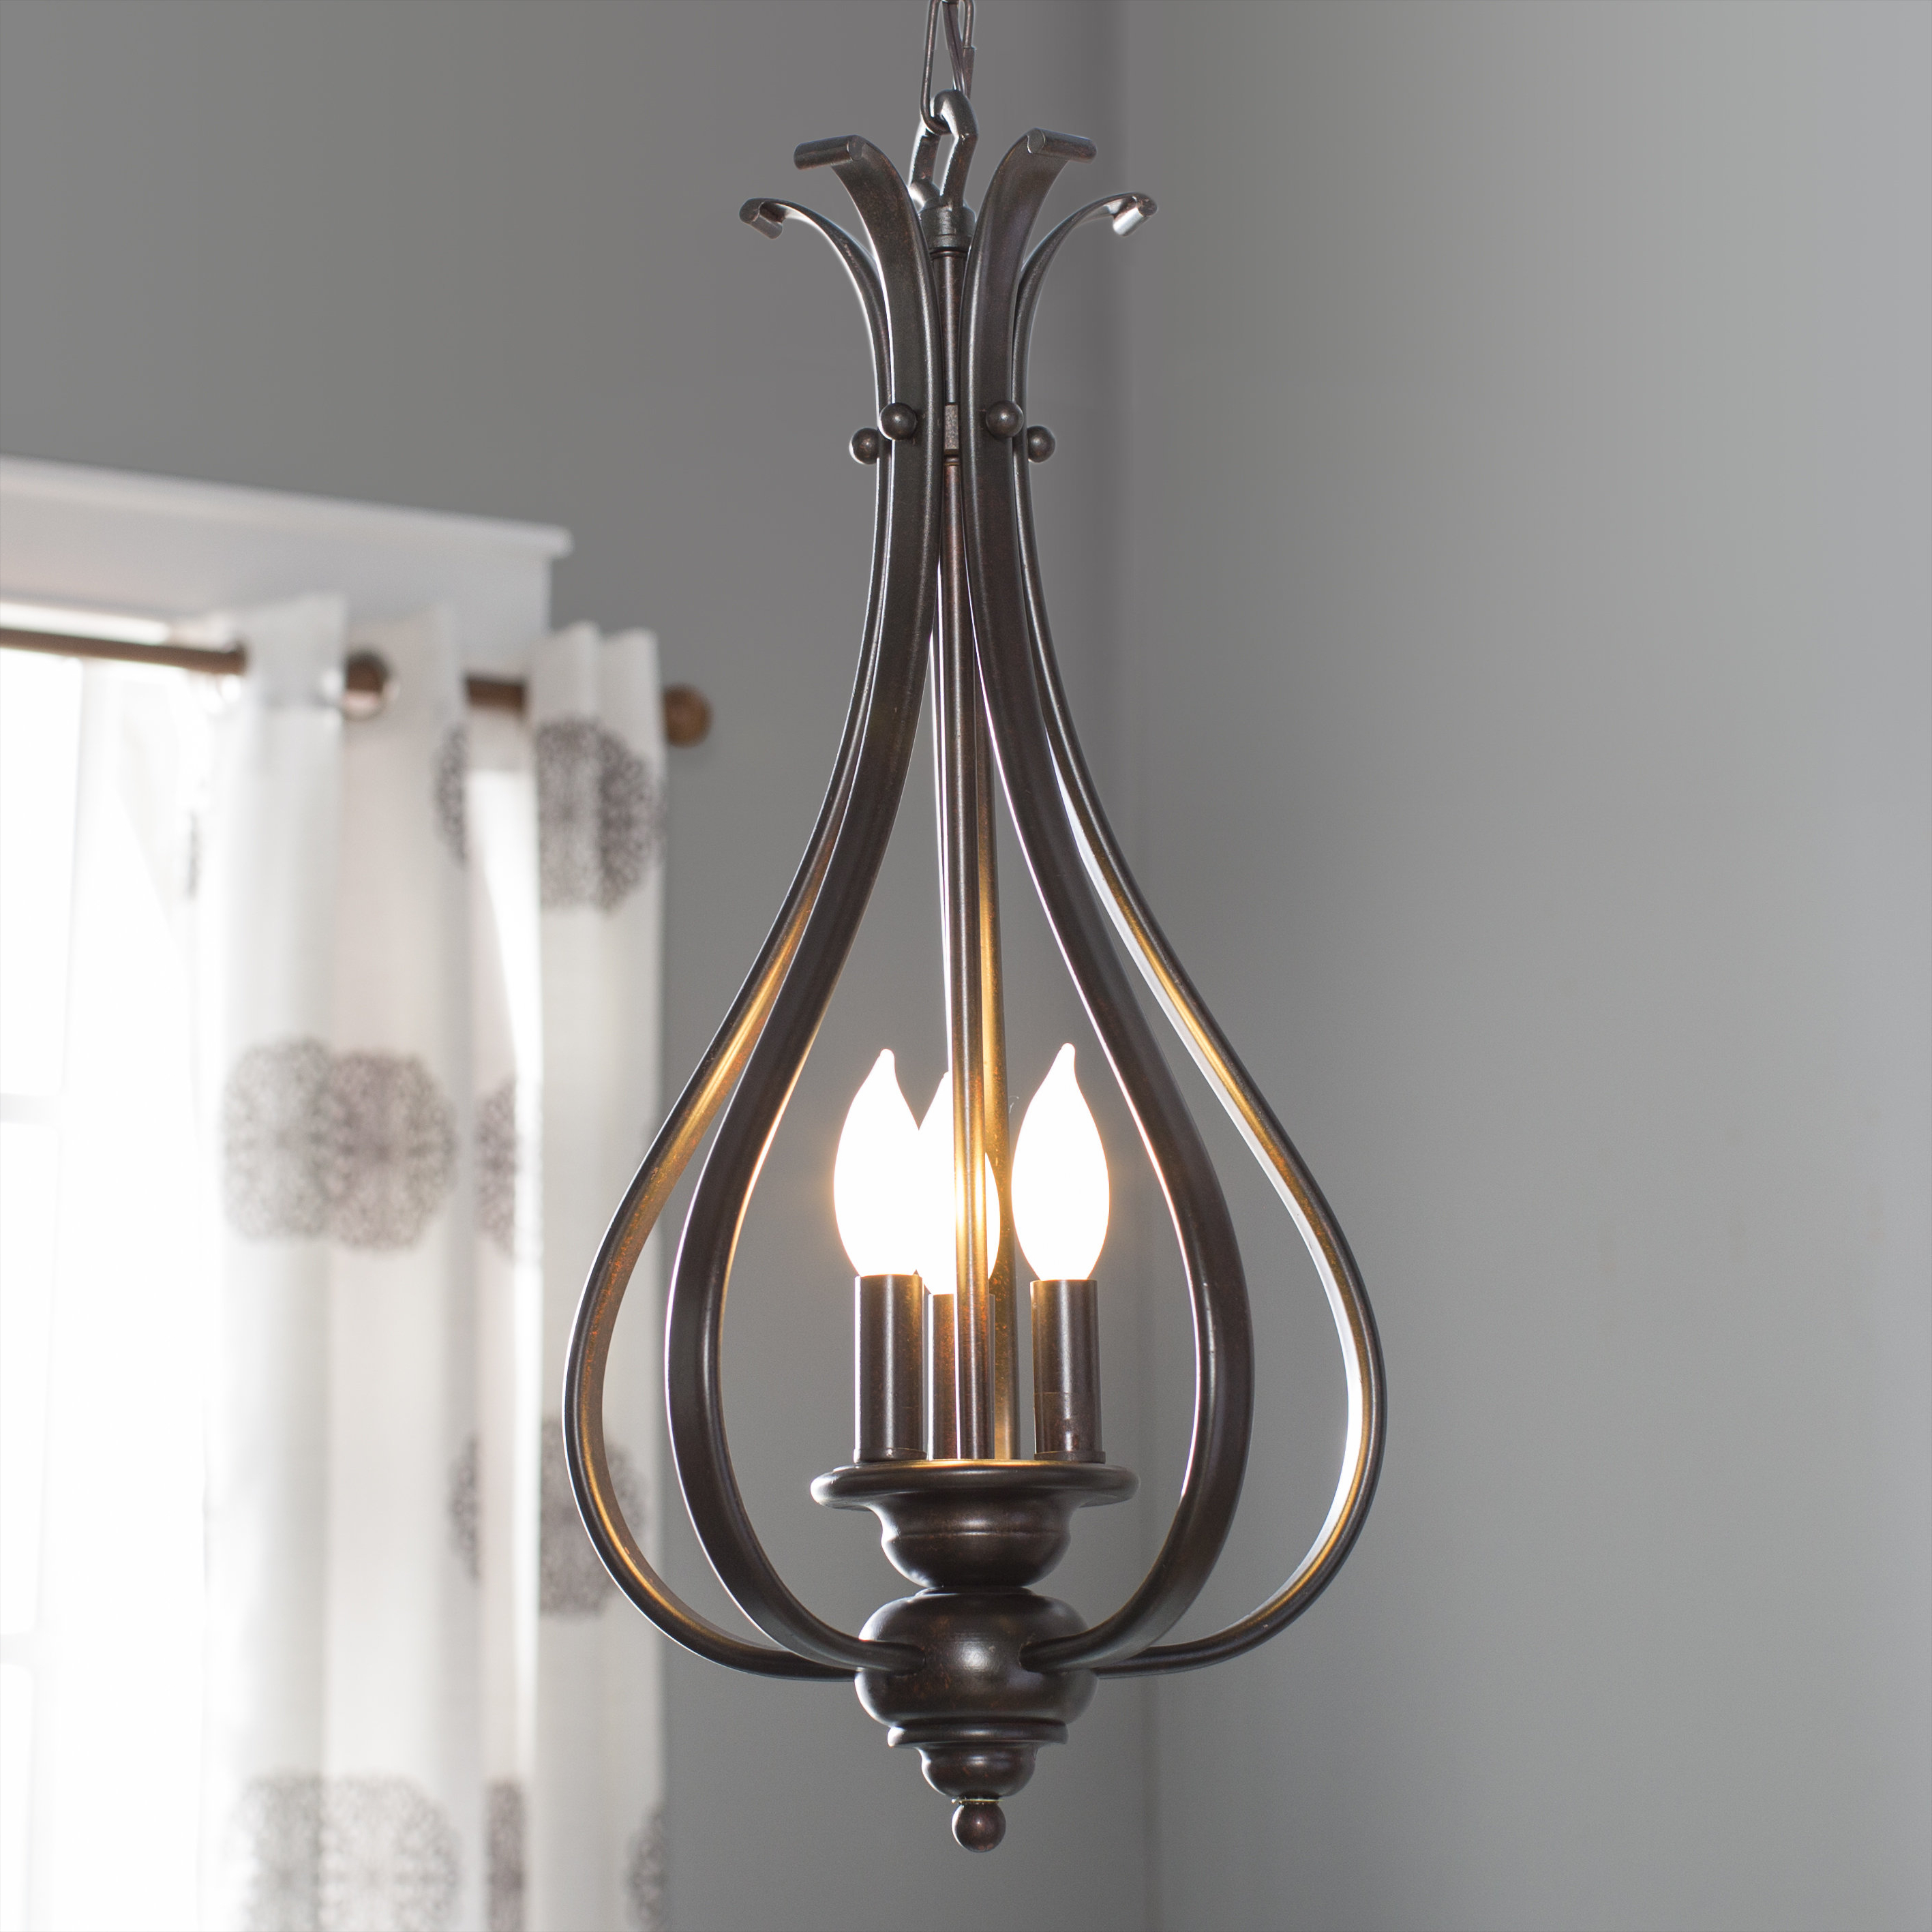 Van Horne 3 Light Single Teardrop Pendant Pertaining To Widely Used Warner Robins 3 Light Lantern Pendants (Gallery 3 of 25)